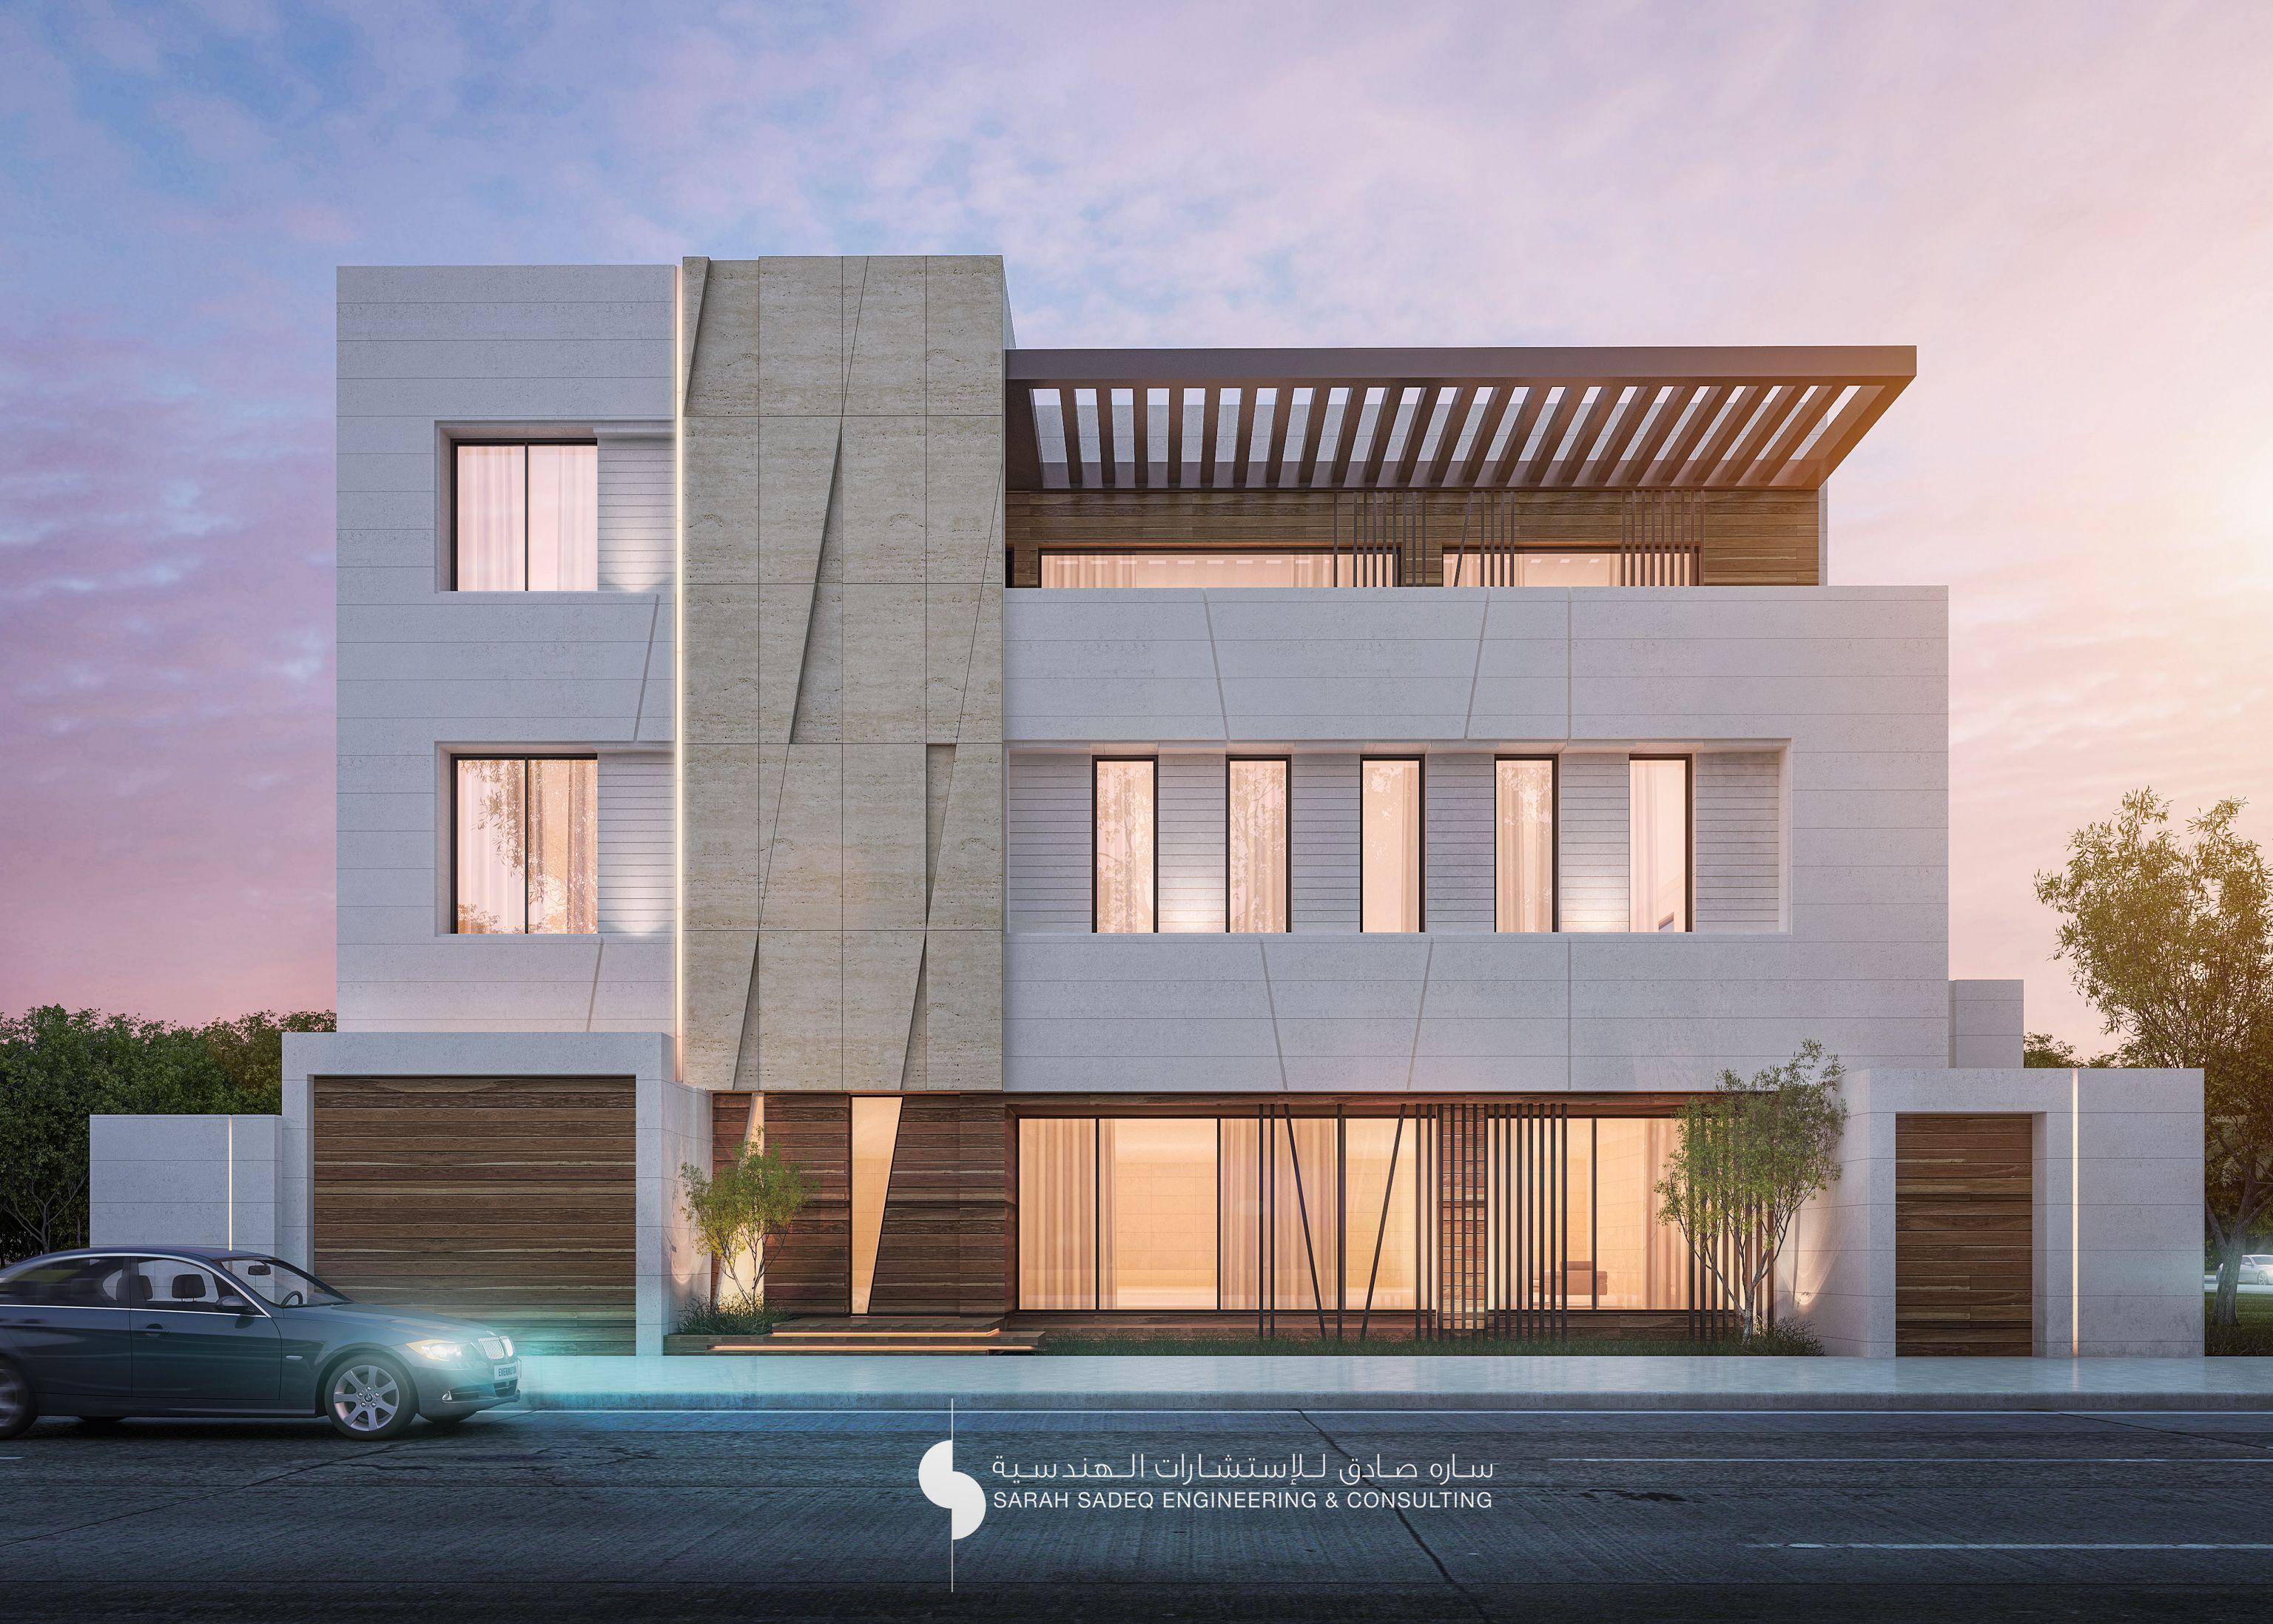 private villa 750 m kuwait sarah sadeq architectes pinterest villas architecture and house. Black Bedroom Furniture Sets. Home Design Ideas